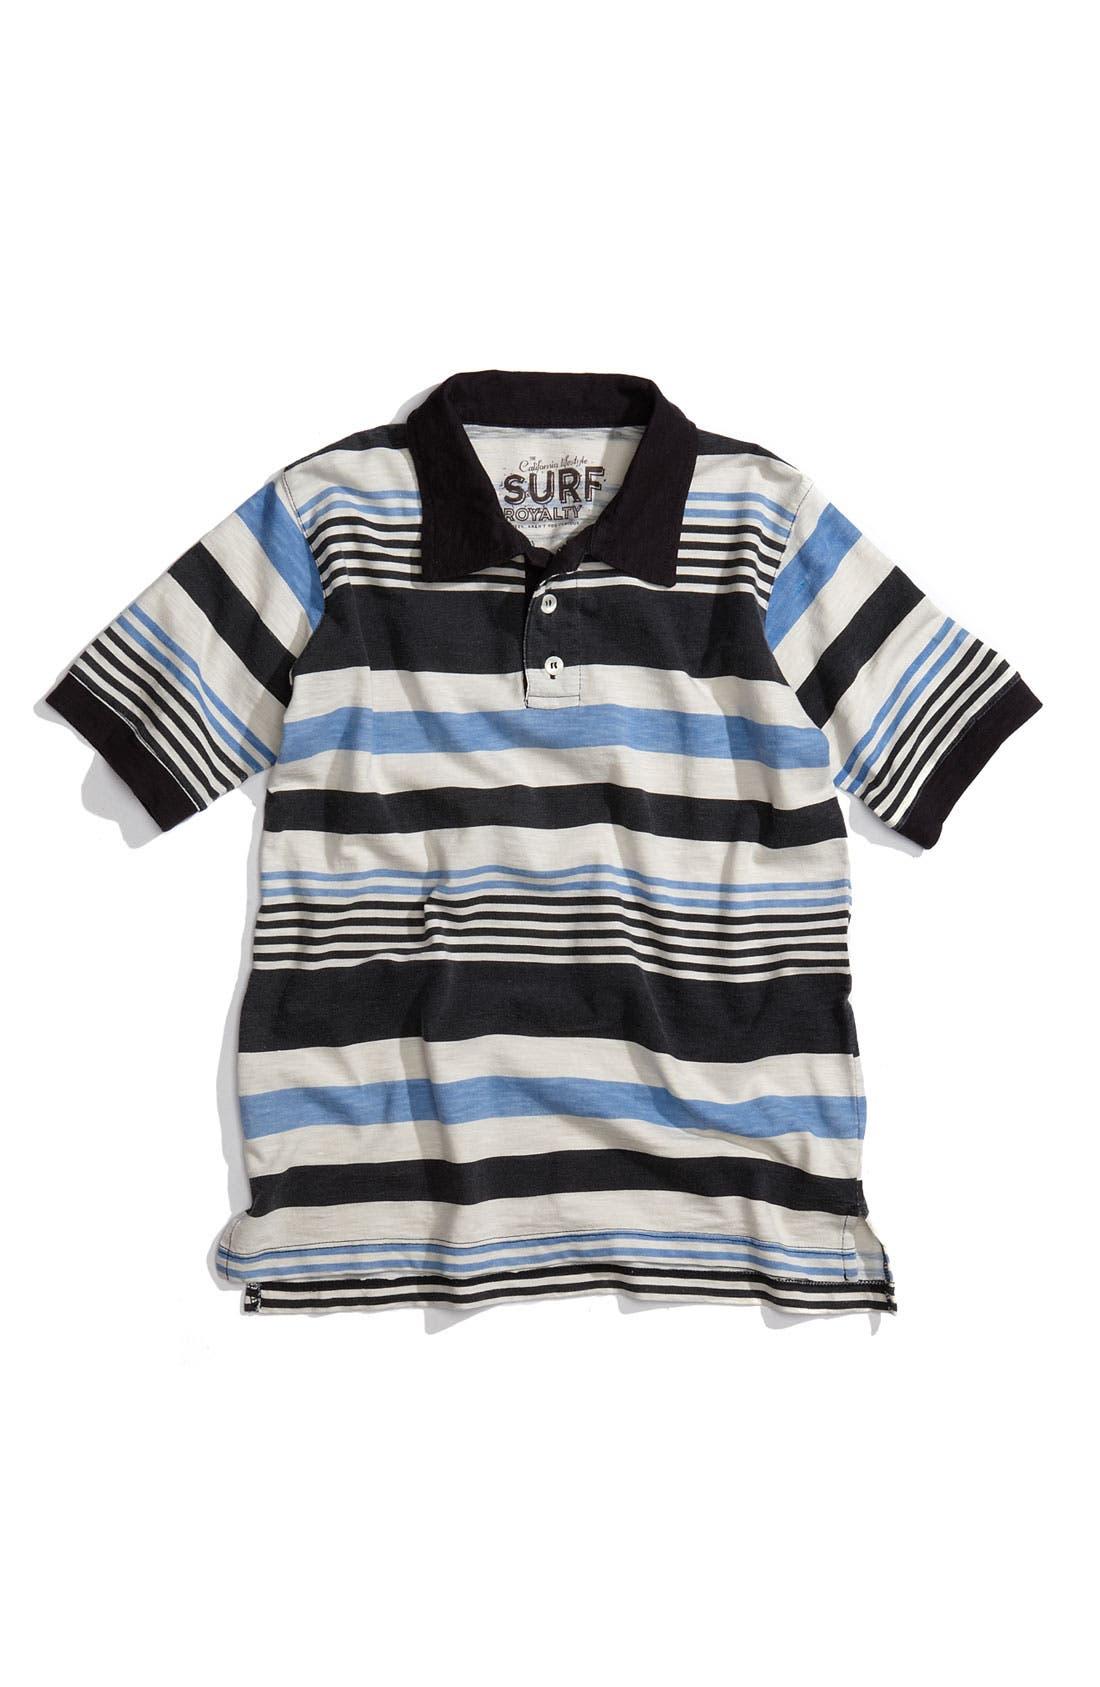 Alternate Image 1 Selected - Peek 'Malibu Stripe' Polo (Toddler)